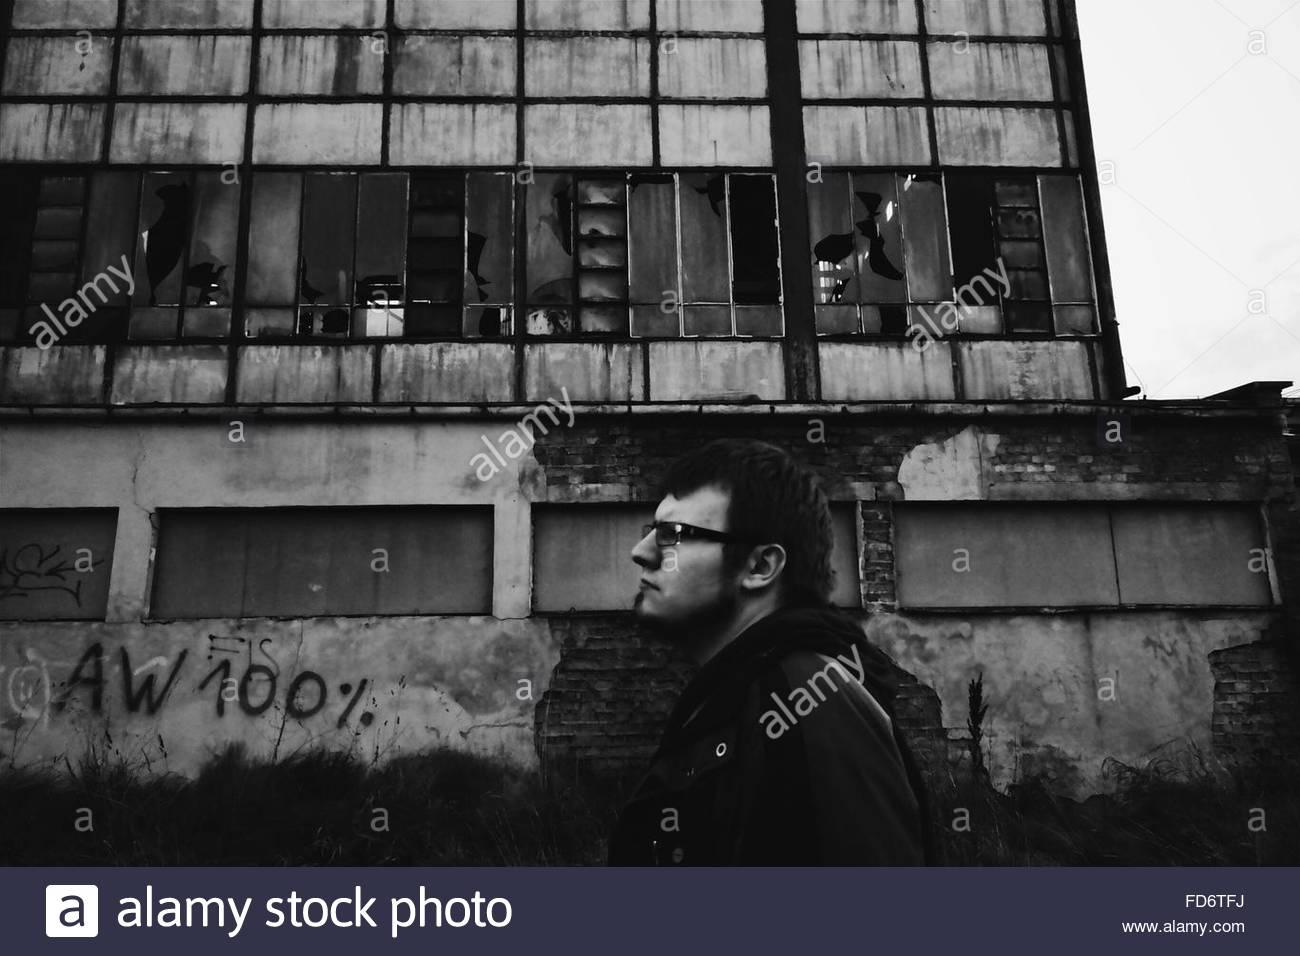 Man Walking Against Abandoned Building Stock Photo Alamy